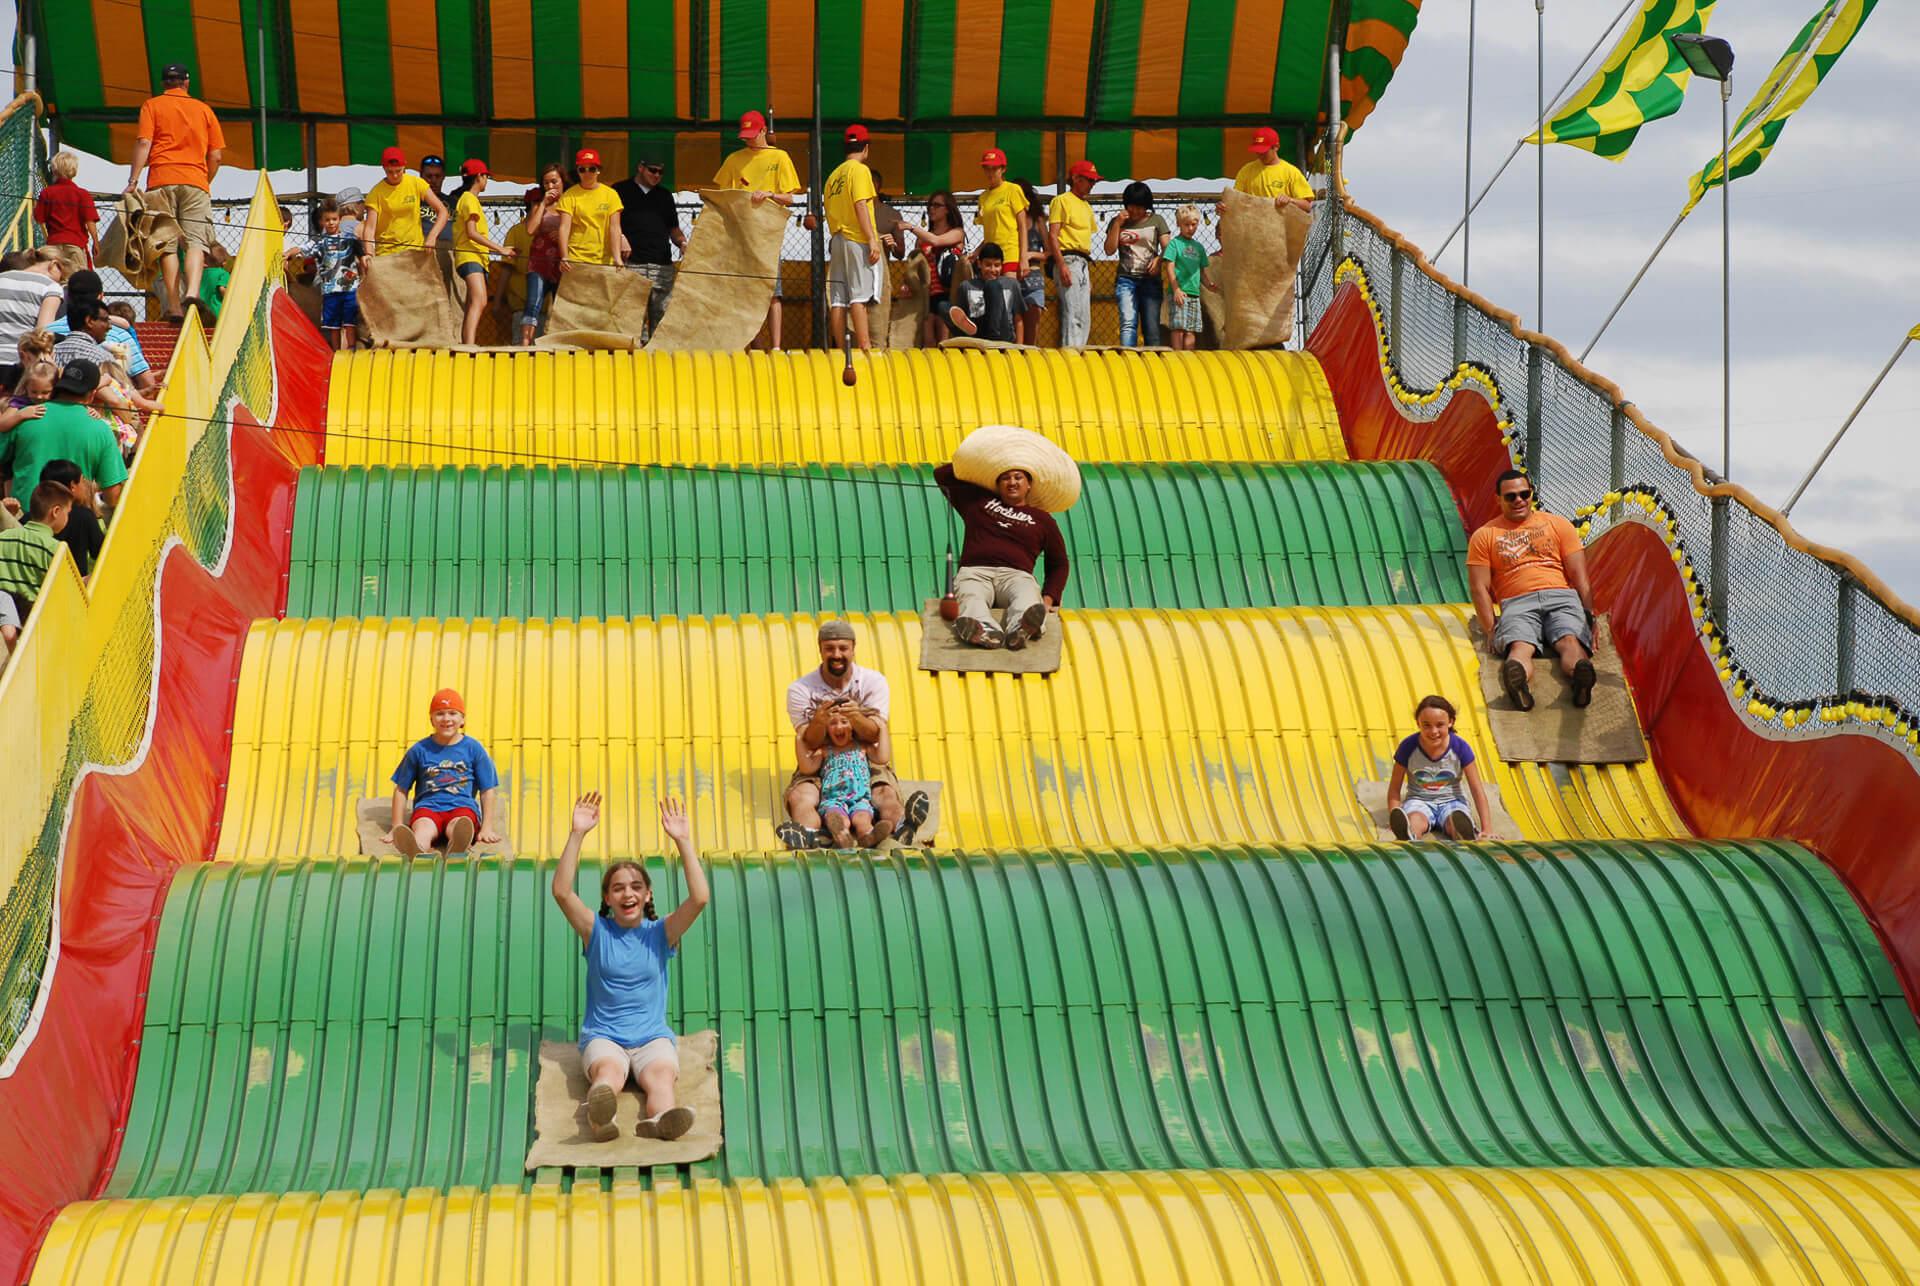 Giant slide at the Minnesota State Fair